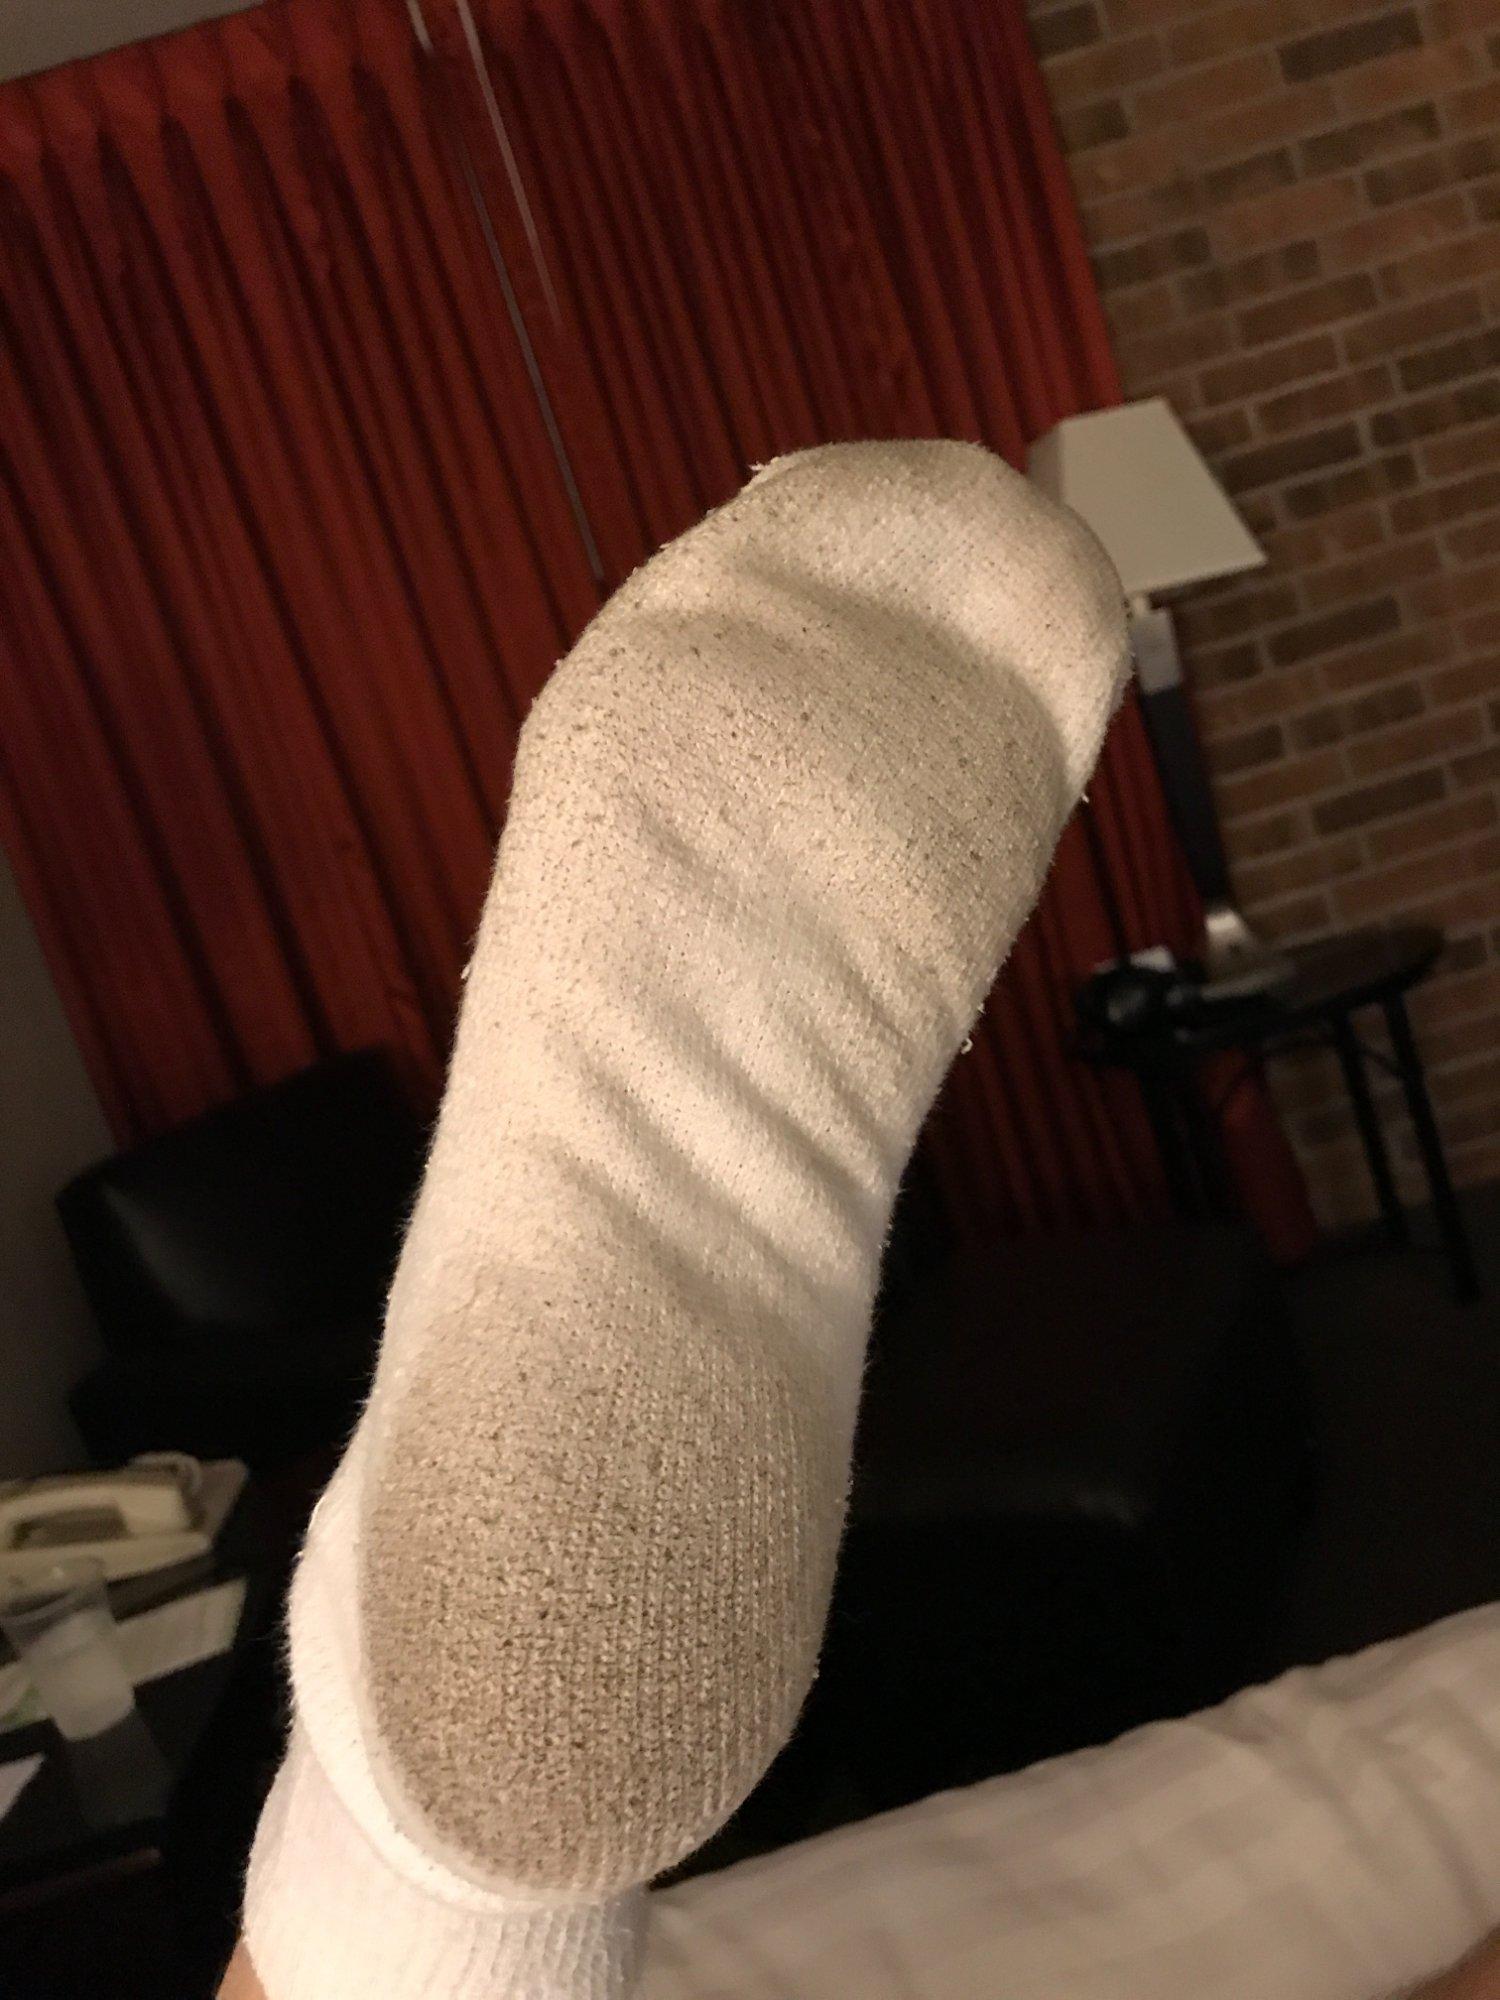 Carpet turns my socks black after 5 minutes :(